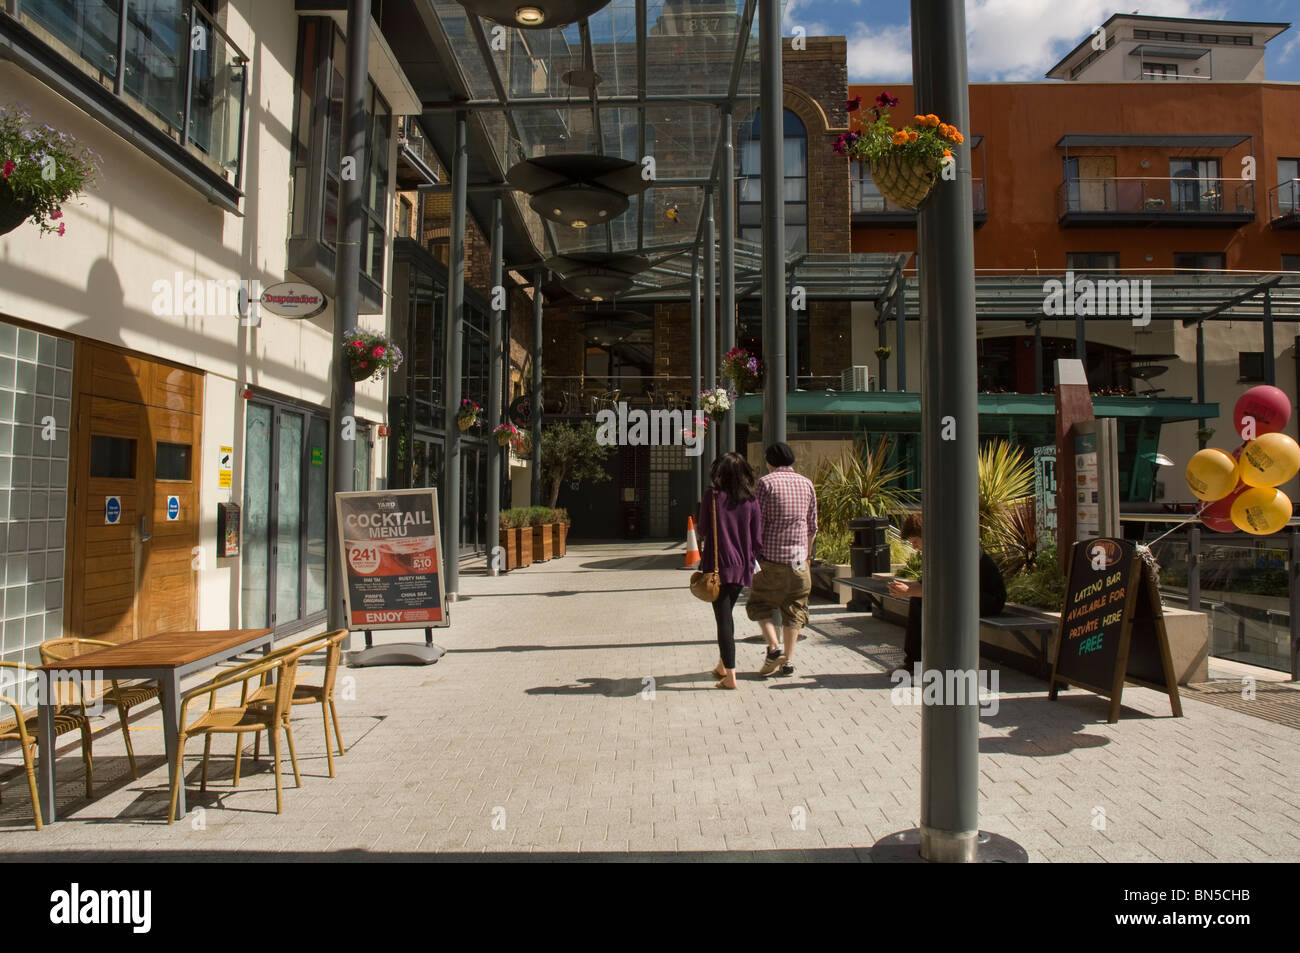 Al fresco restaurant exterior, Brains Brewery, Cardiff, Wales, UK, Europe - Stock Image